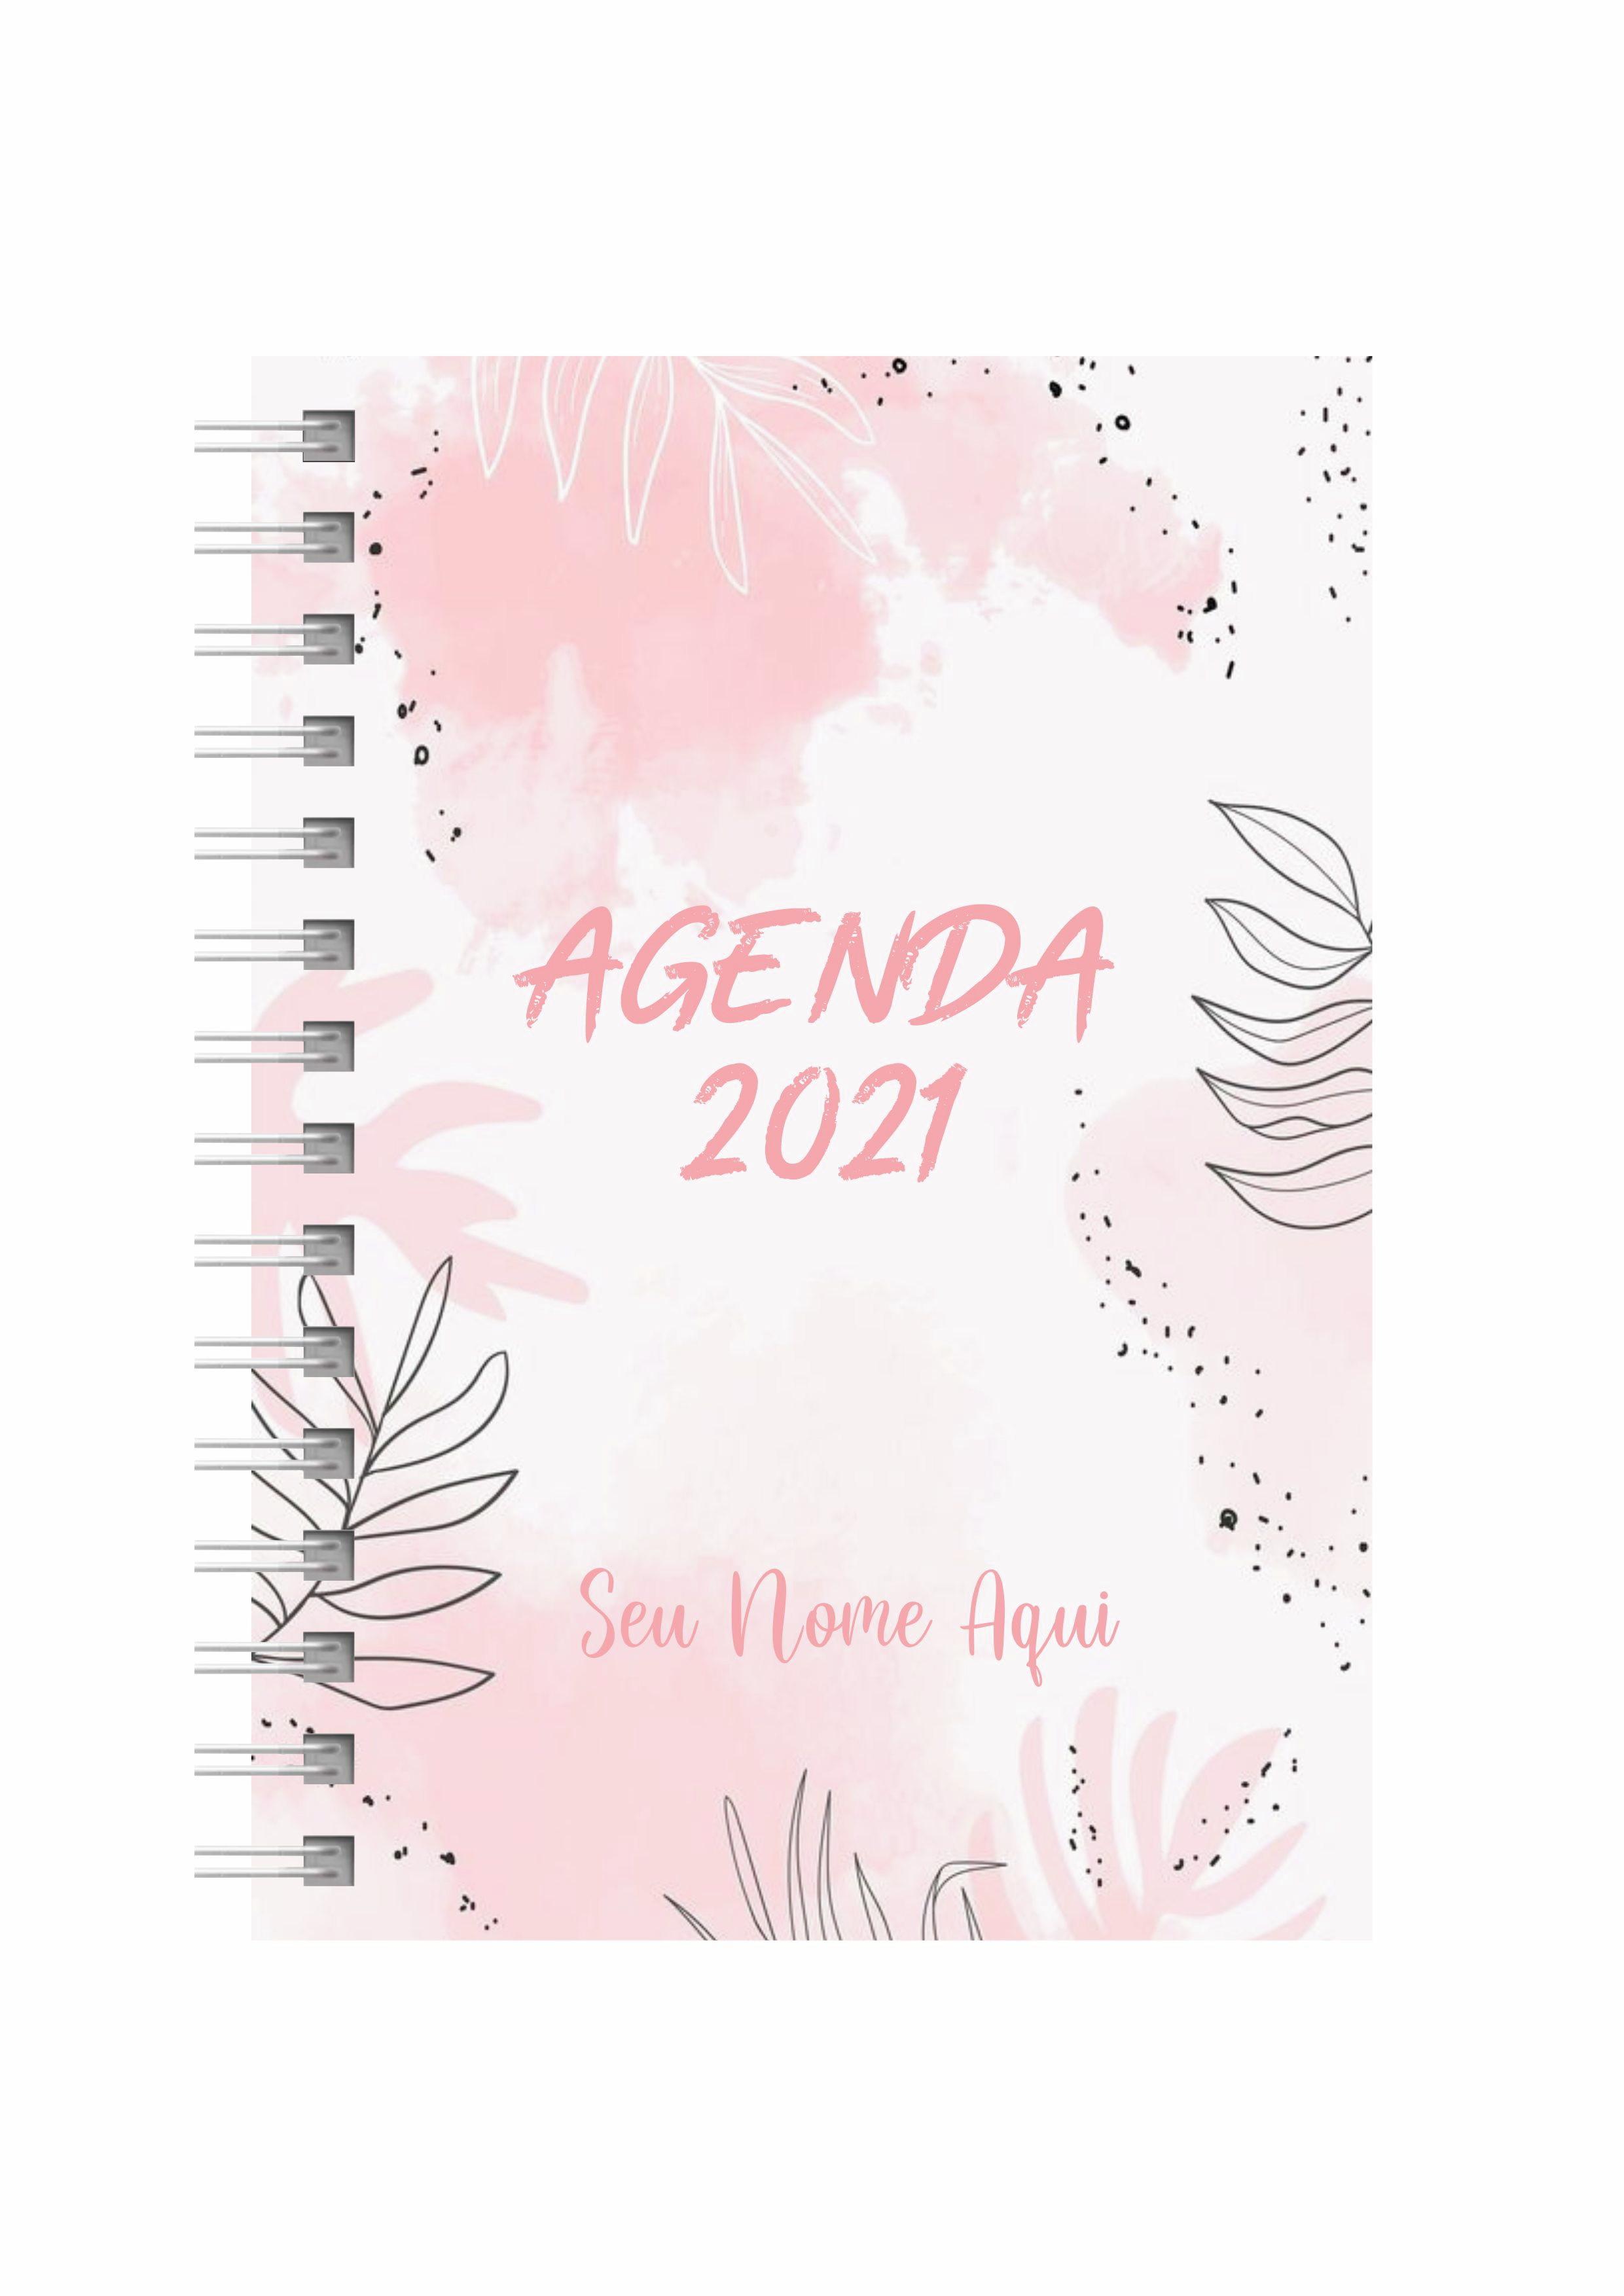 Agenda Personalizada 2021 Floral No Elo7 Renato Faria Almeida 12686f7